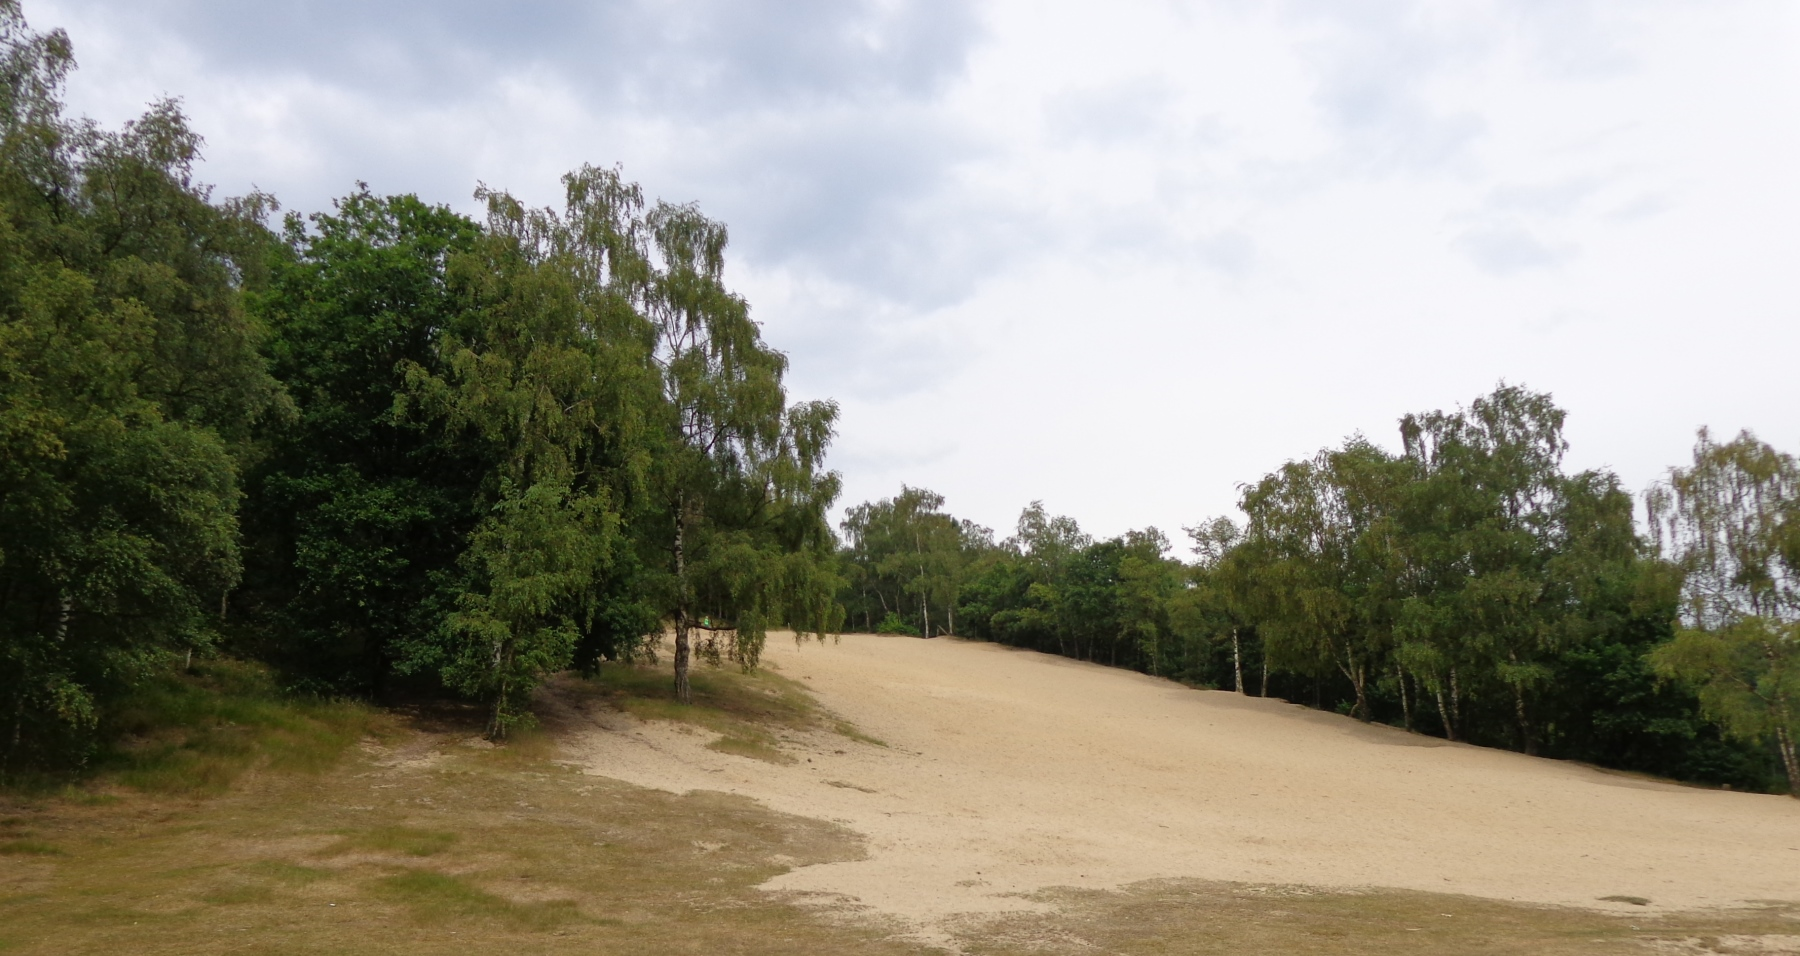 Doornse Gat - Utrechtse Heuvelrug